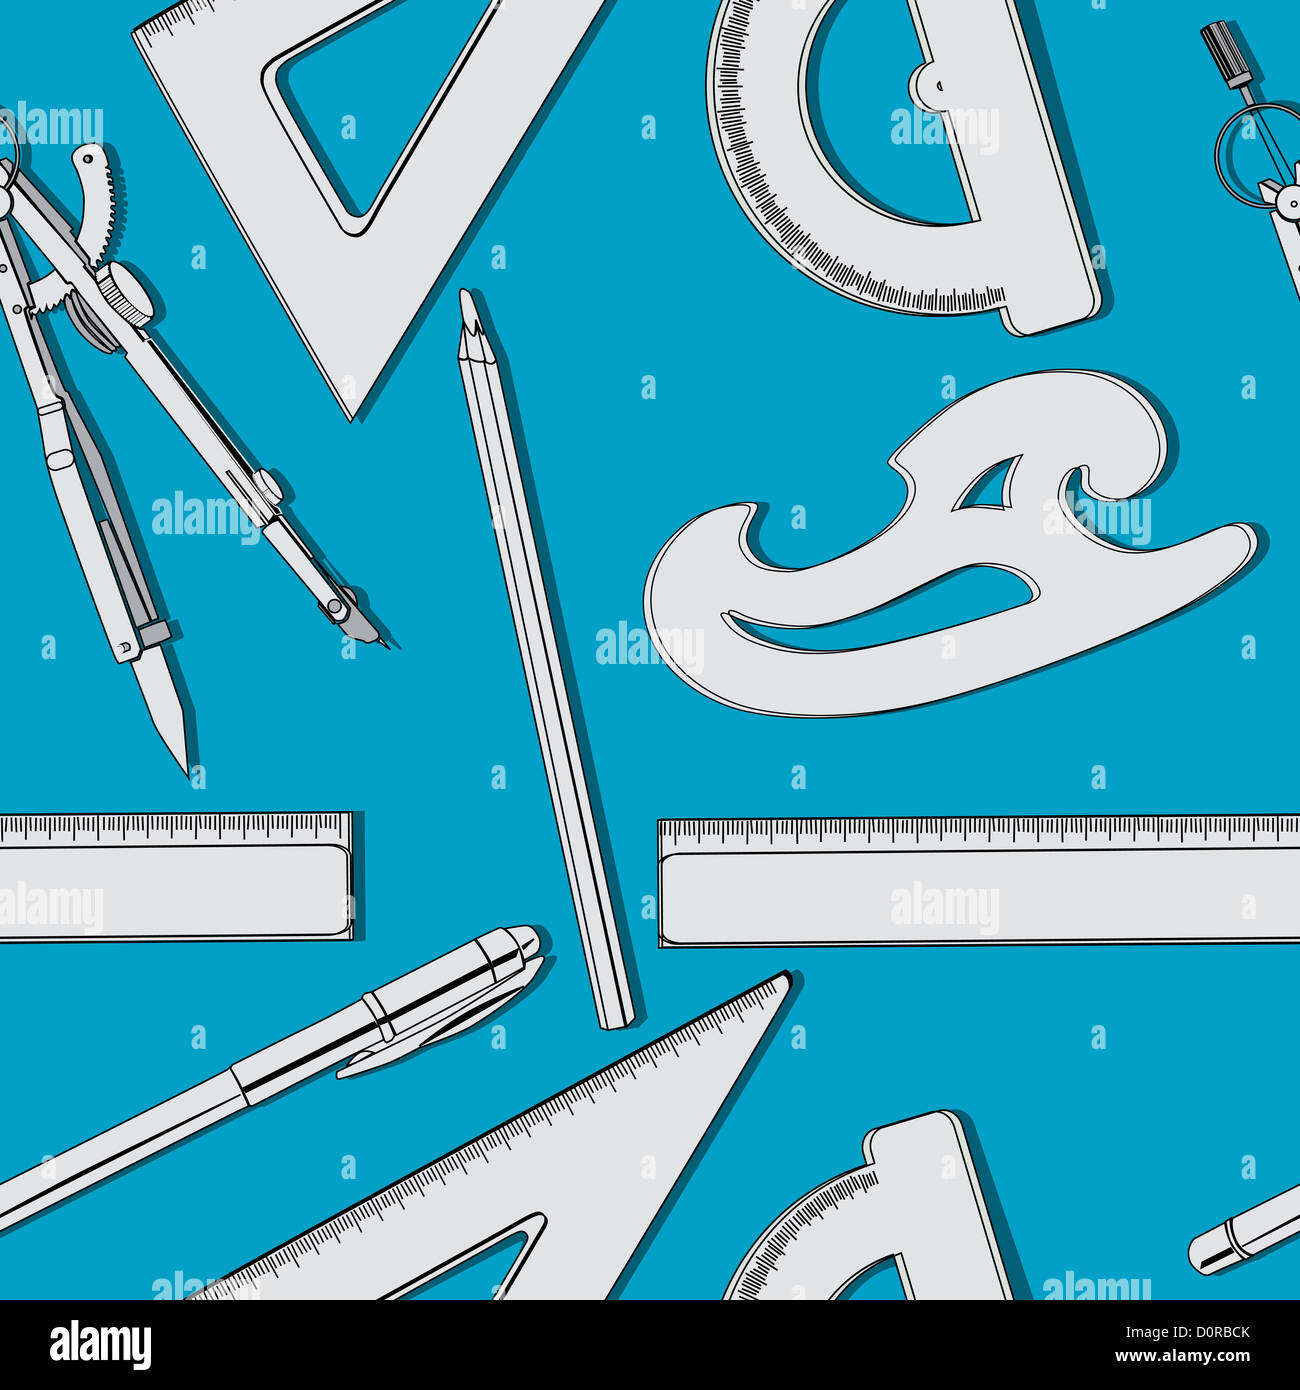 School supplies pattern - Stock Image